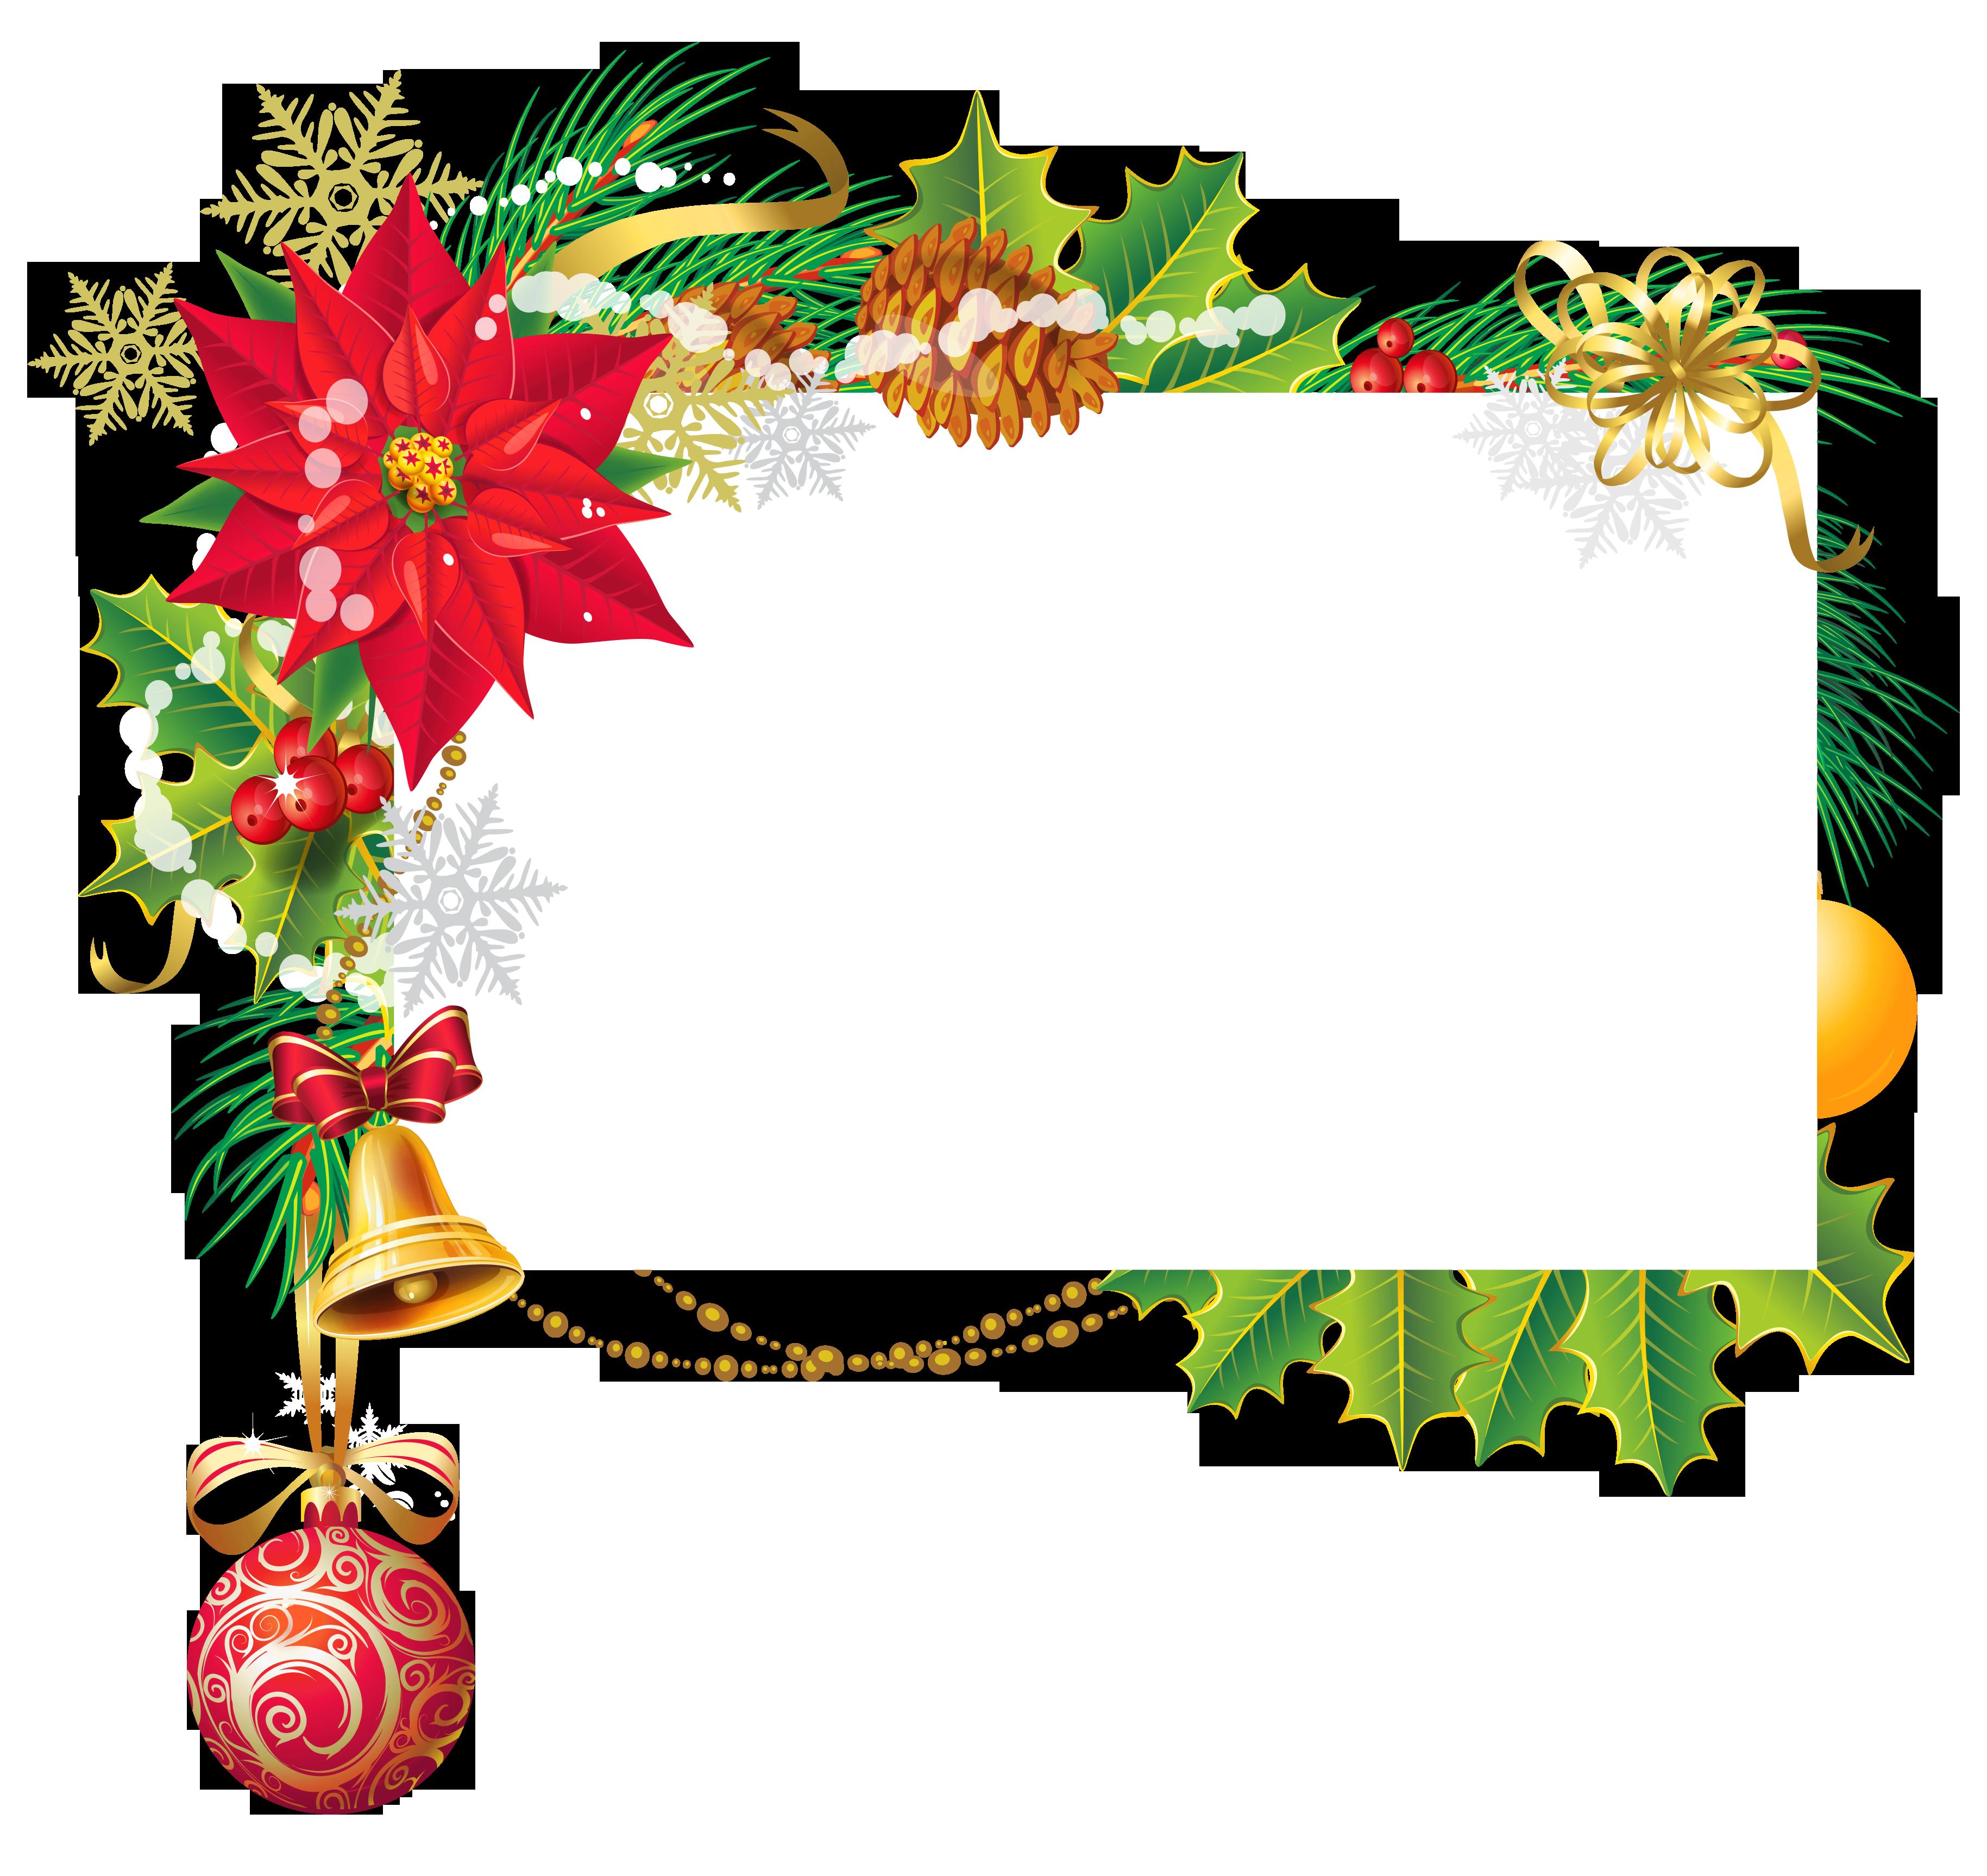 Christmas corner border clipart clip transparent download Images of Christmas Corner Border Png - #SpaceHero clip transparent download